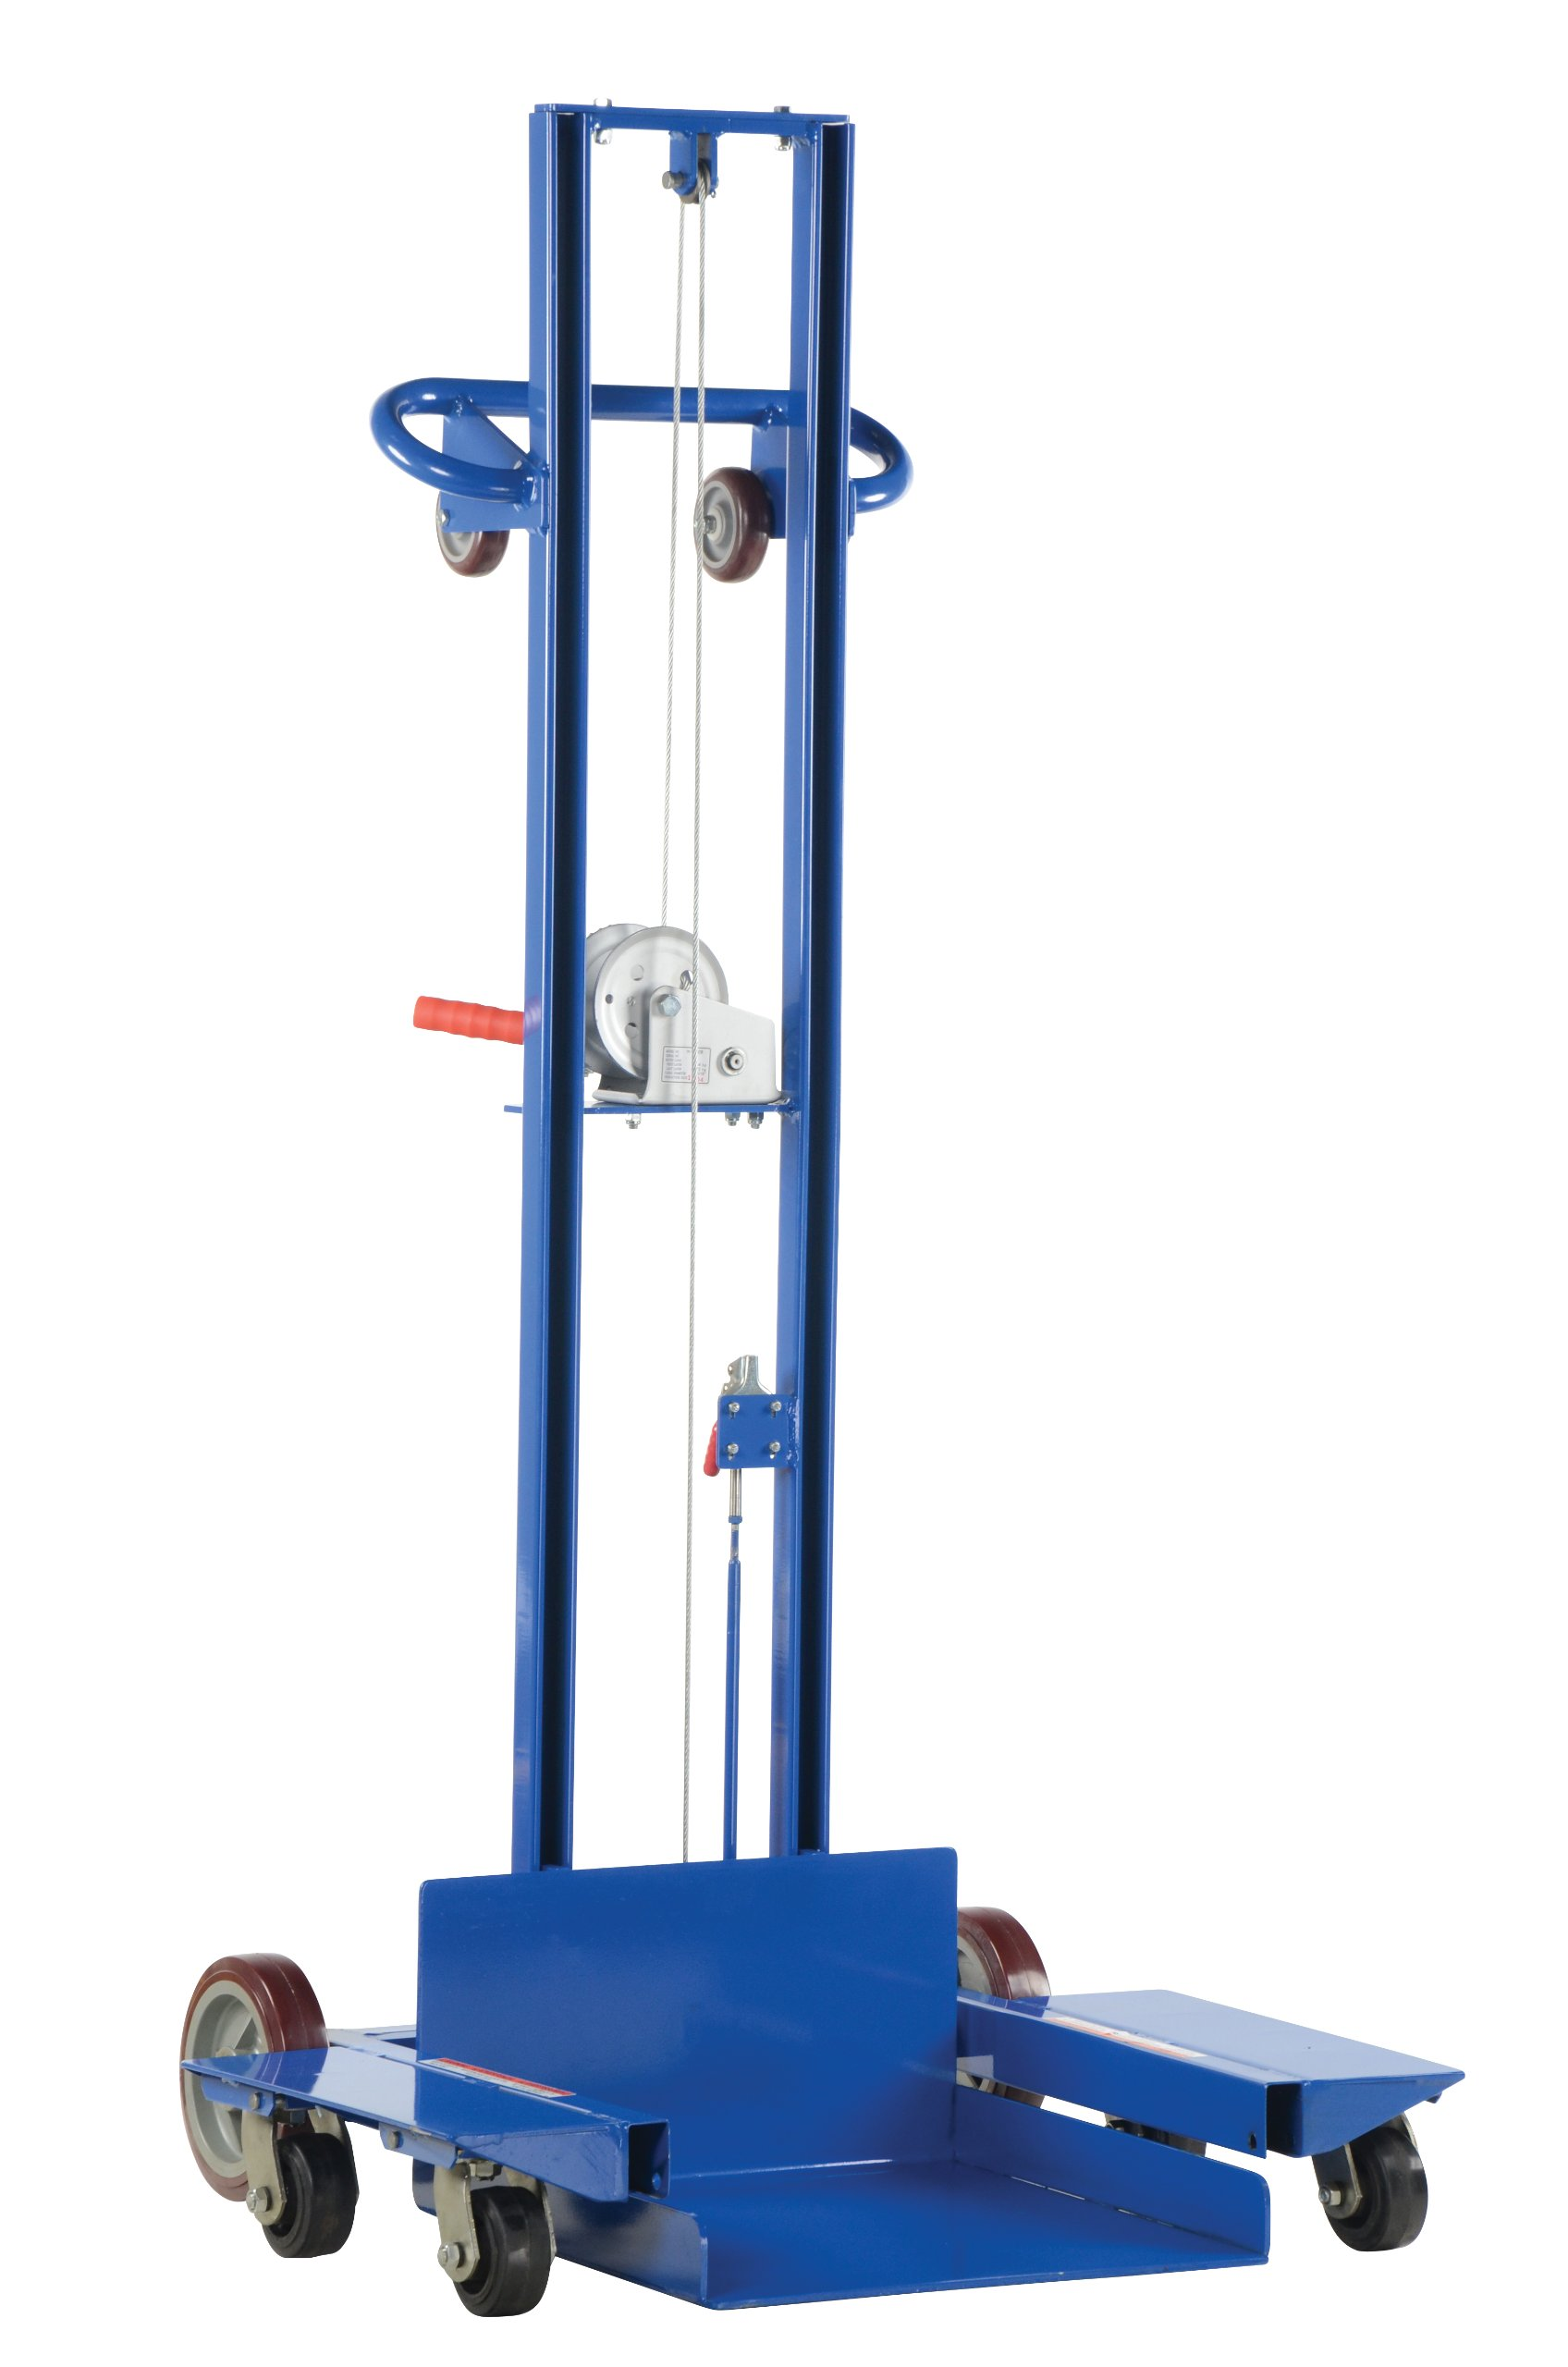 Vestil LLPW-500-4SFL Low Profile Lite Load Lift with Winch, Steel, 29-13/16'' Length, 37-7/16'' Width, 69-7/16'' Height, 500 lbs Capacity